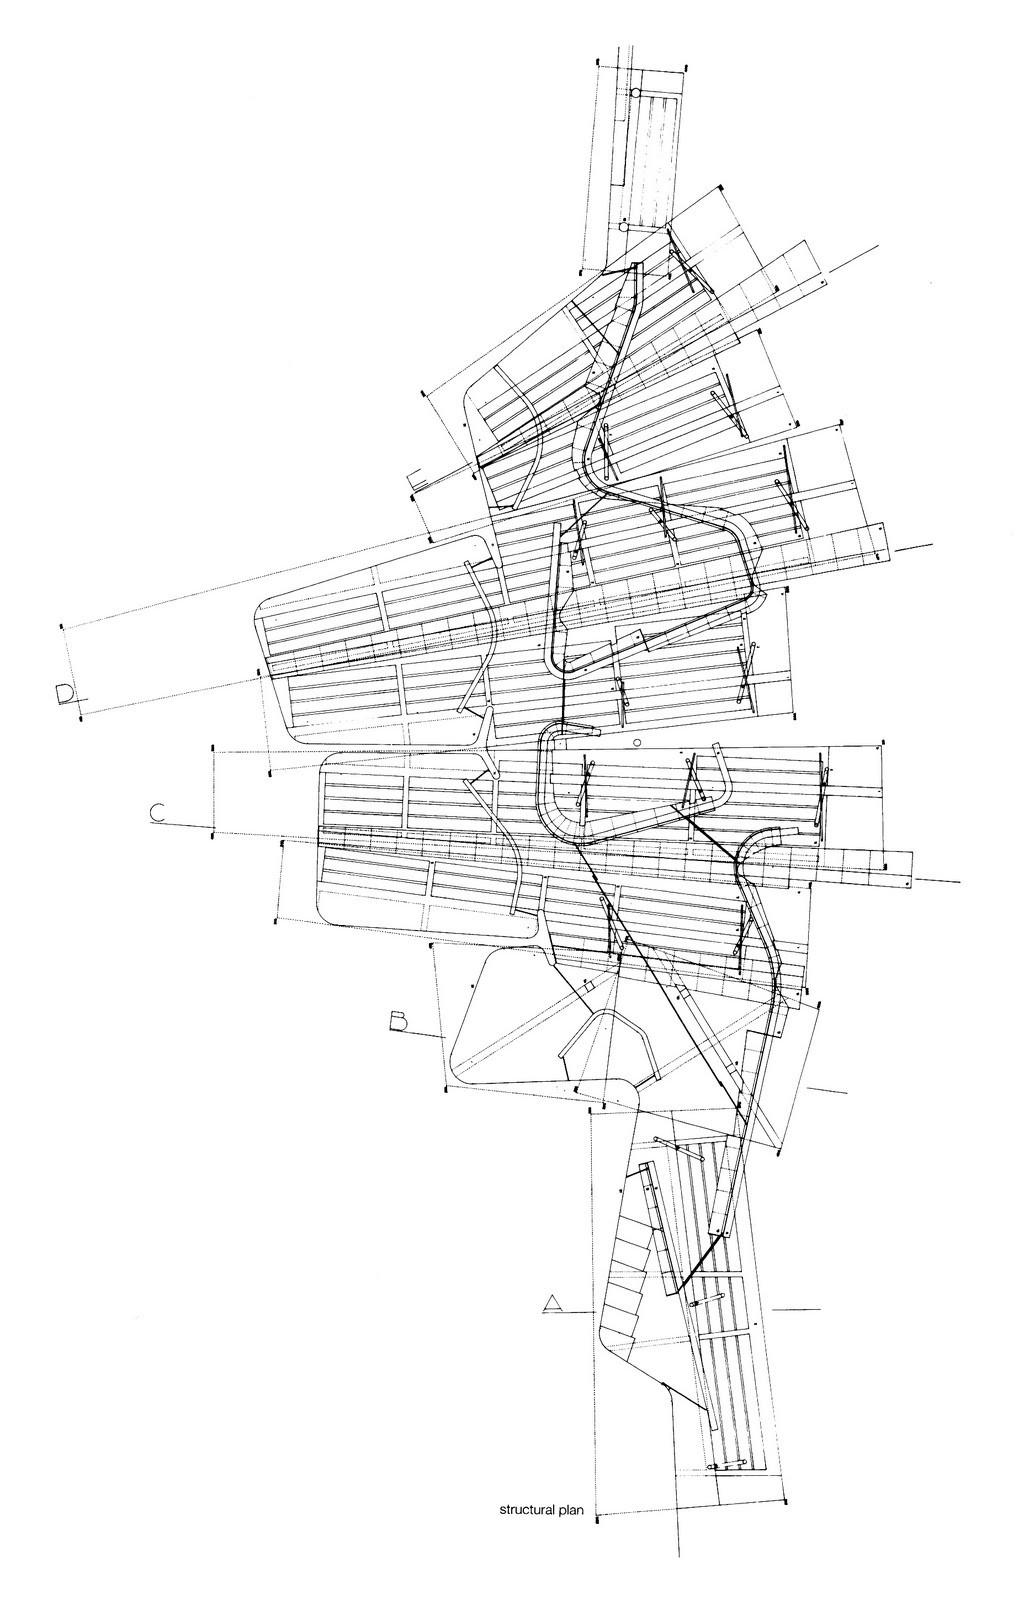 Floor Plan Sketch Software Ad Classics Olympic Archery Range Enric Miralles